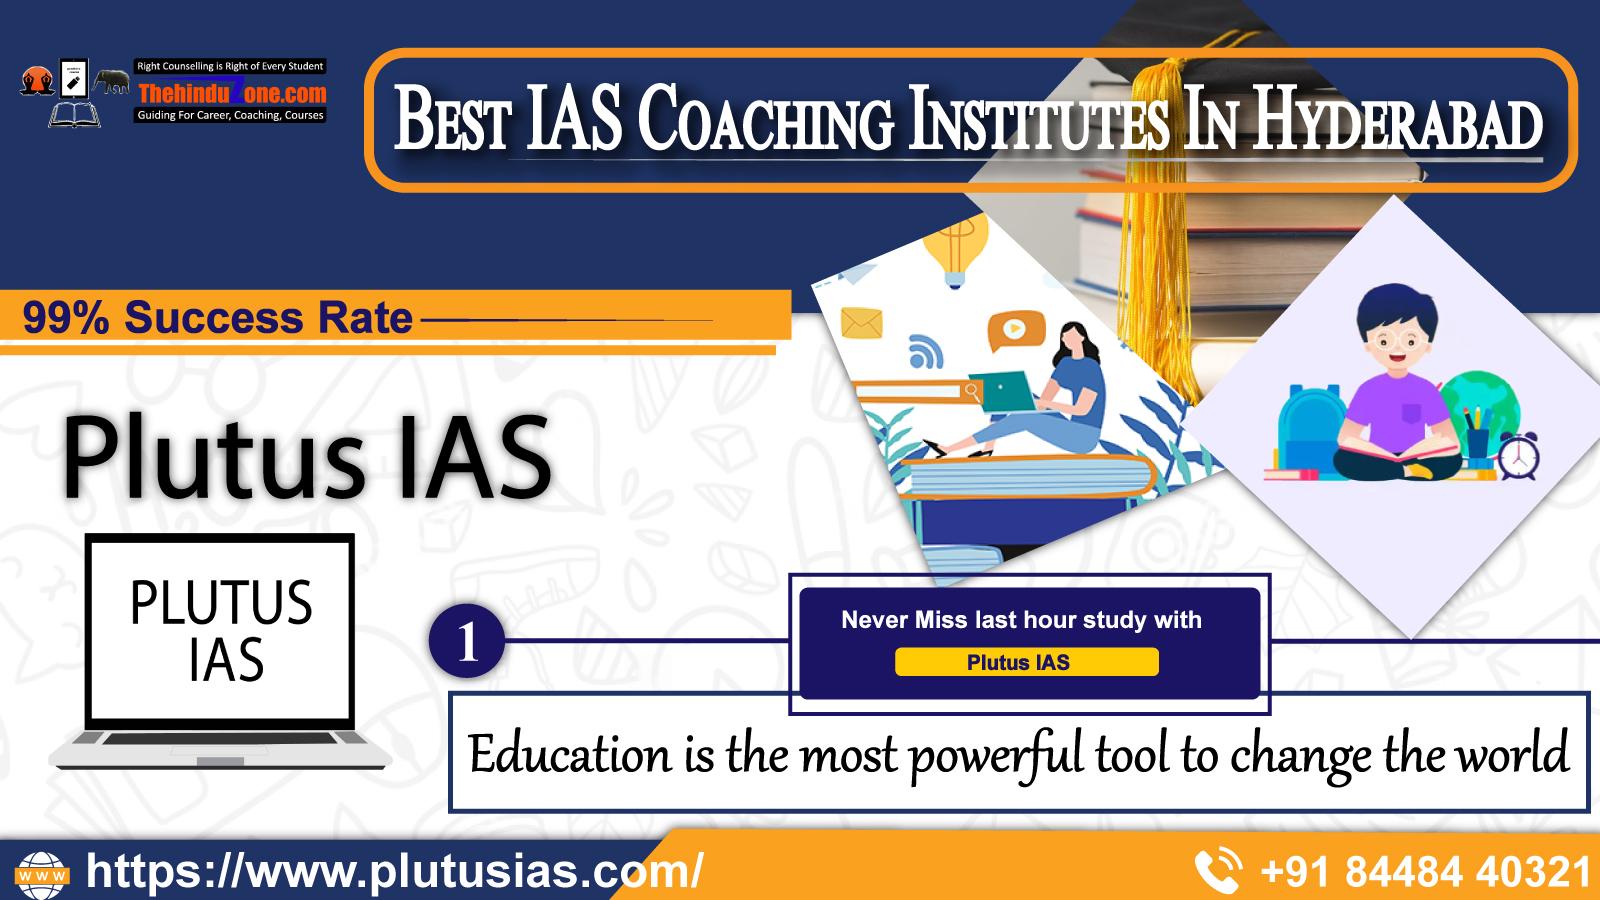 Plutus ias coaching in hyderabad